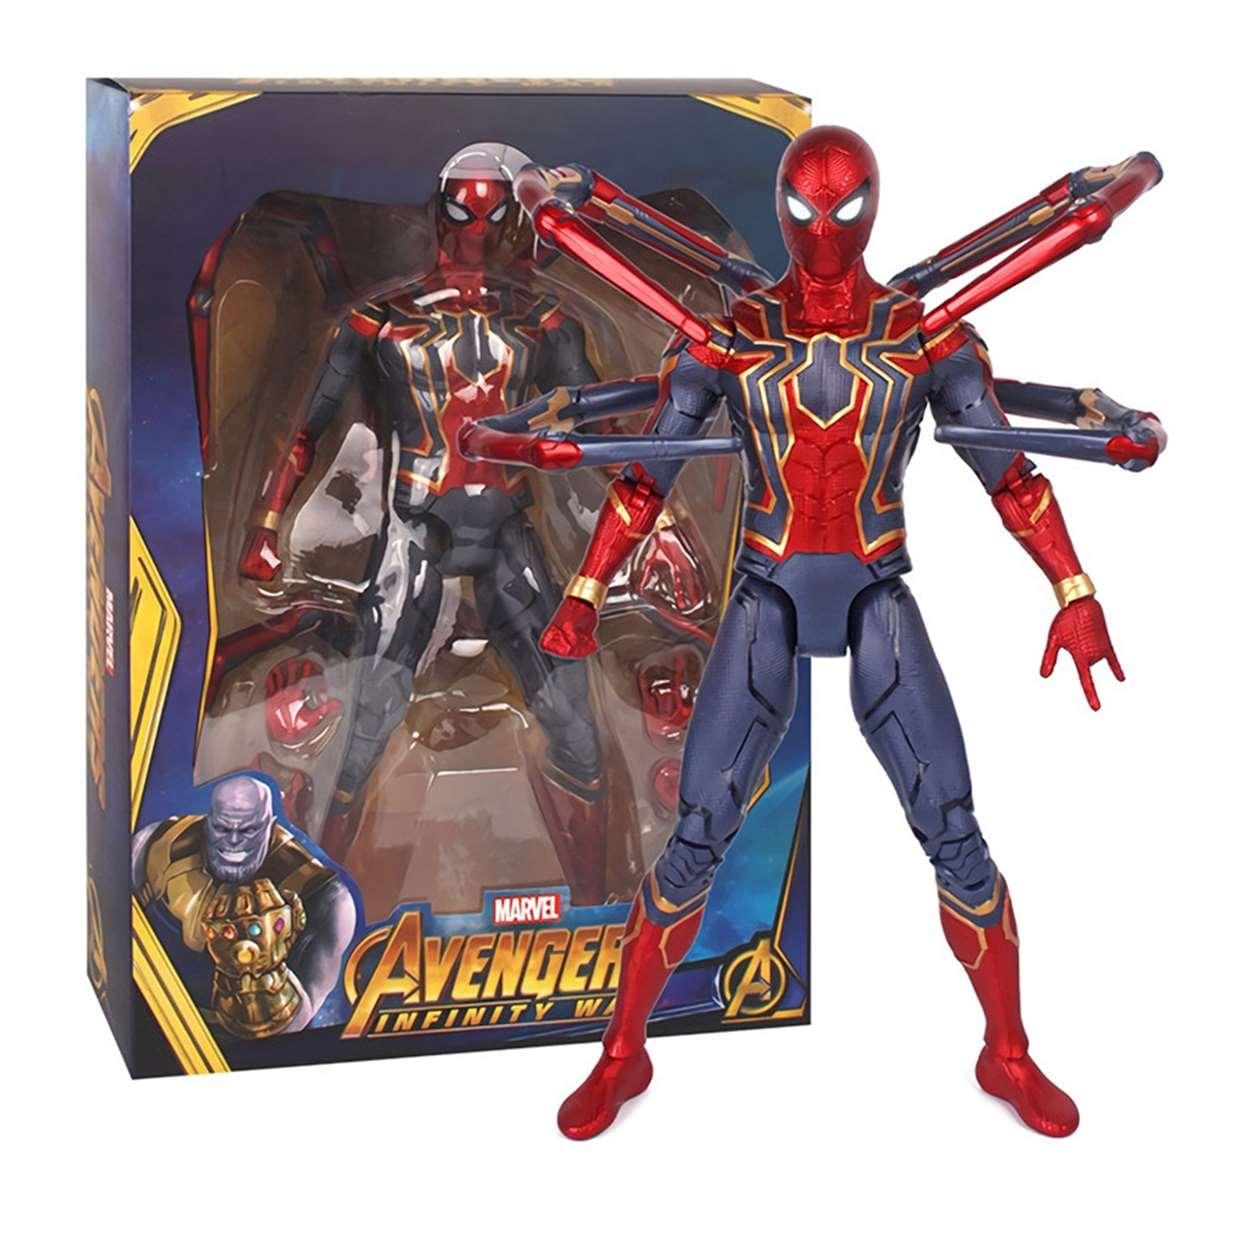 Iron Spider Figura Avengers Infinity War Con Luz Led 15 PuLG